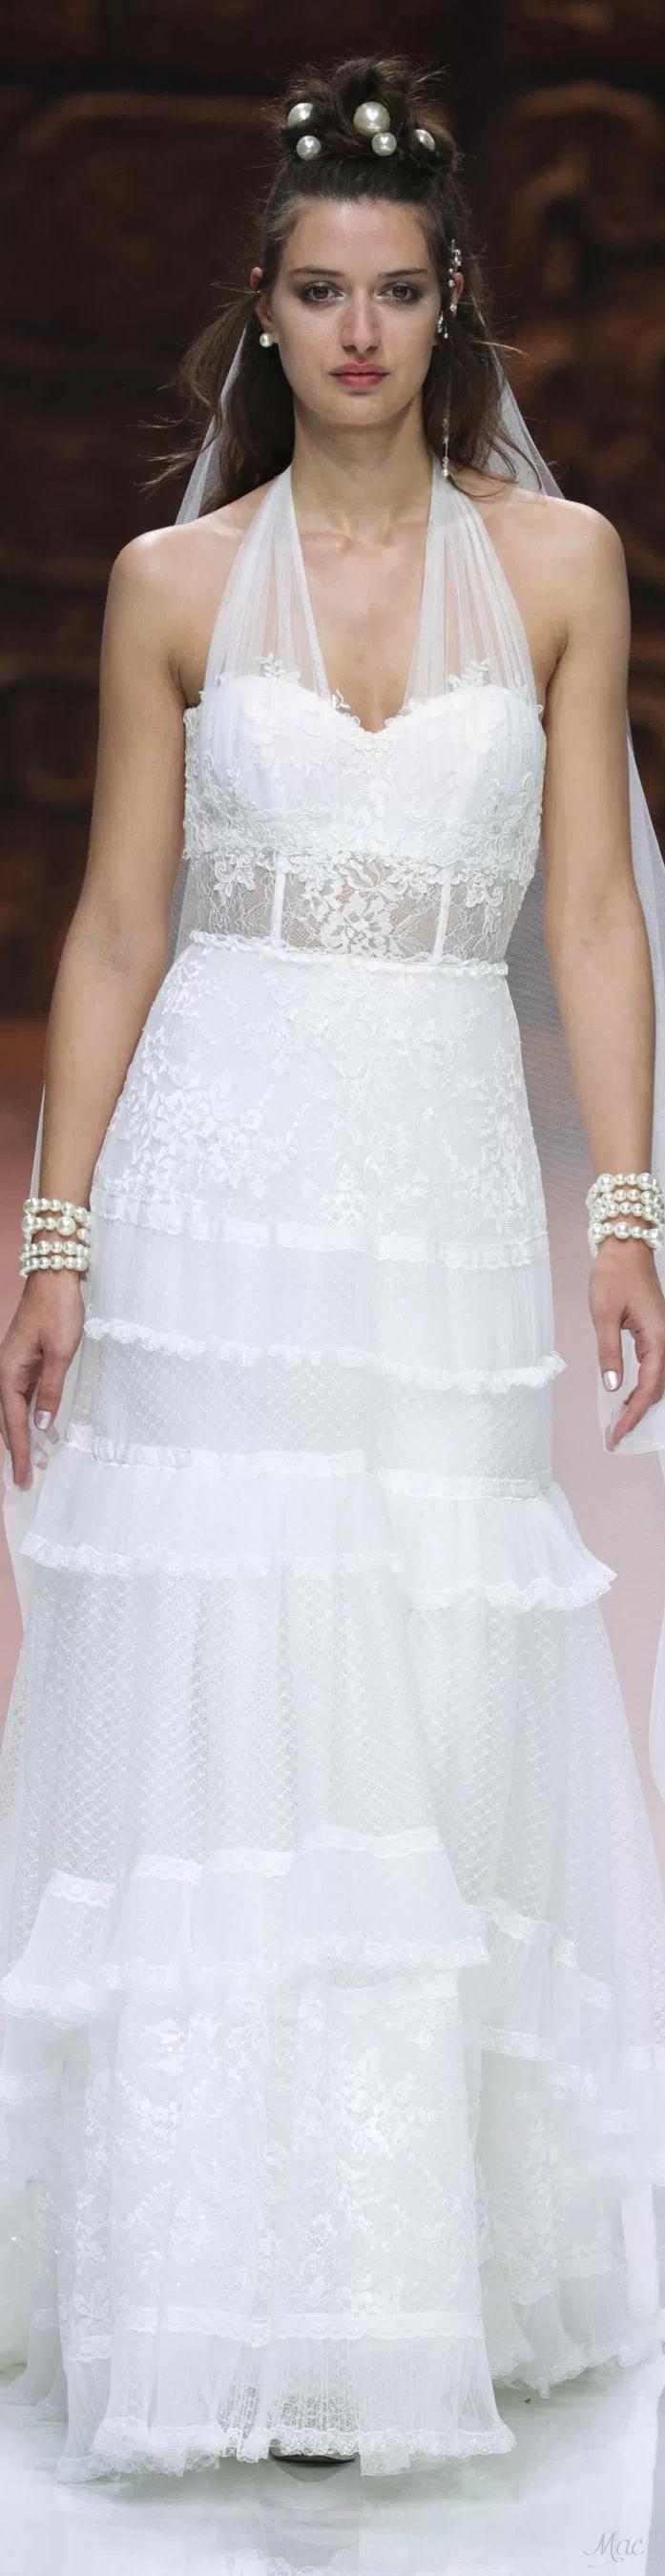 Lace v neck maxi dress april 2019 Spring  Bridal Immaculada Garcia  Spring  Bridal  Pinterest